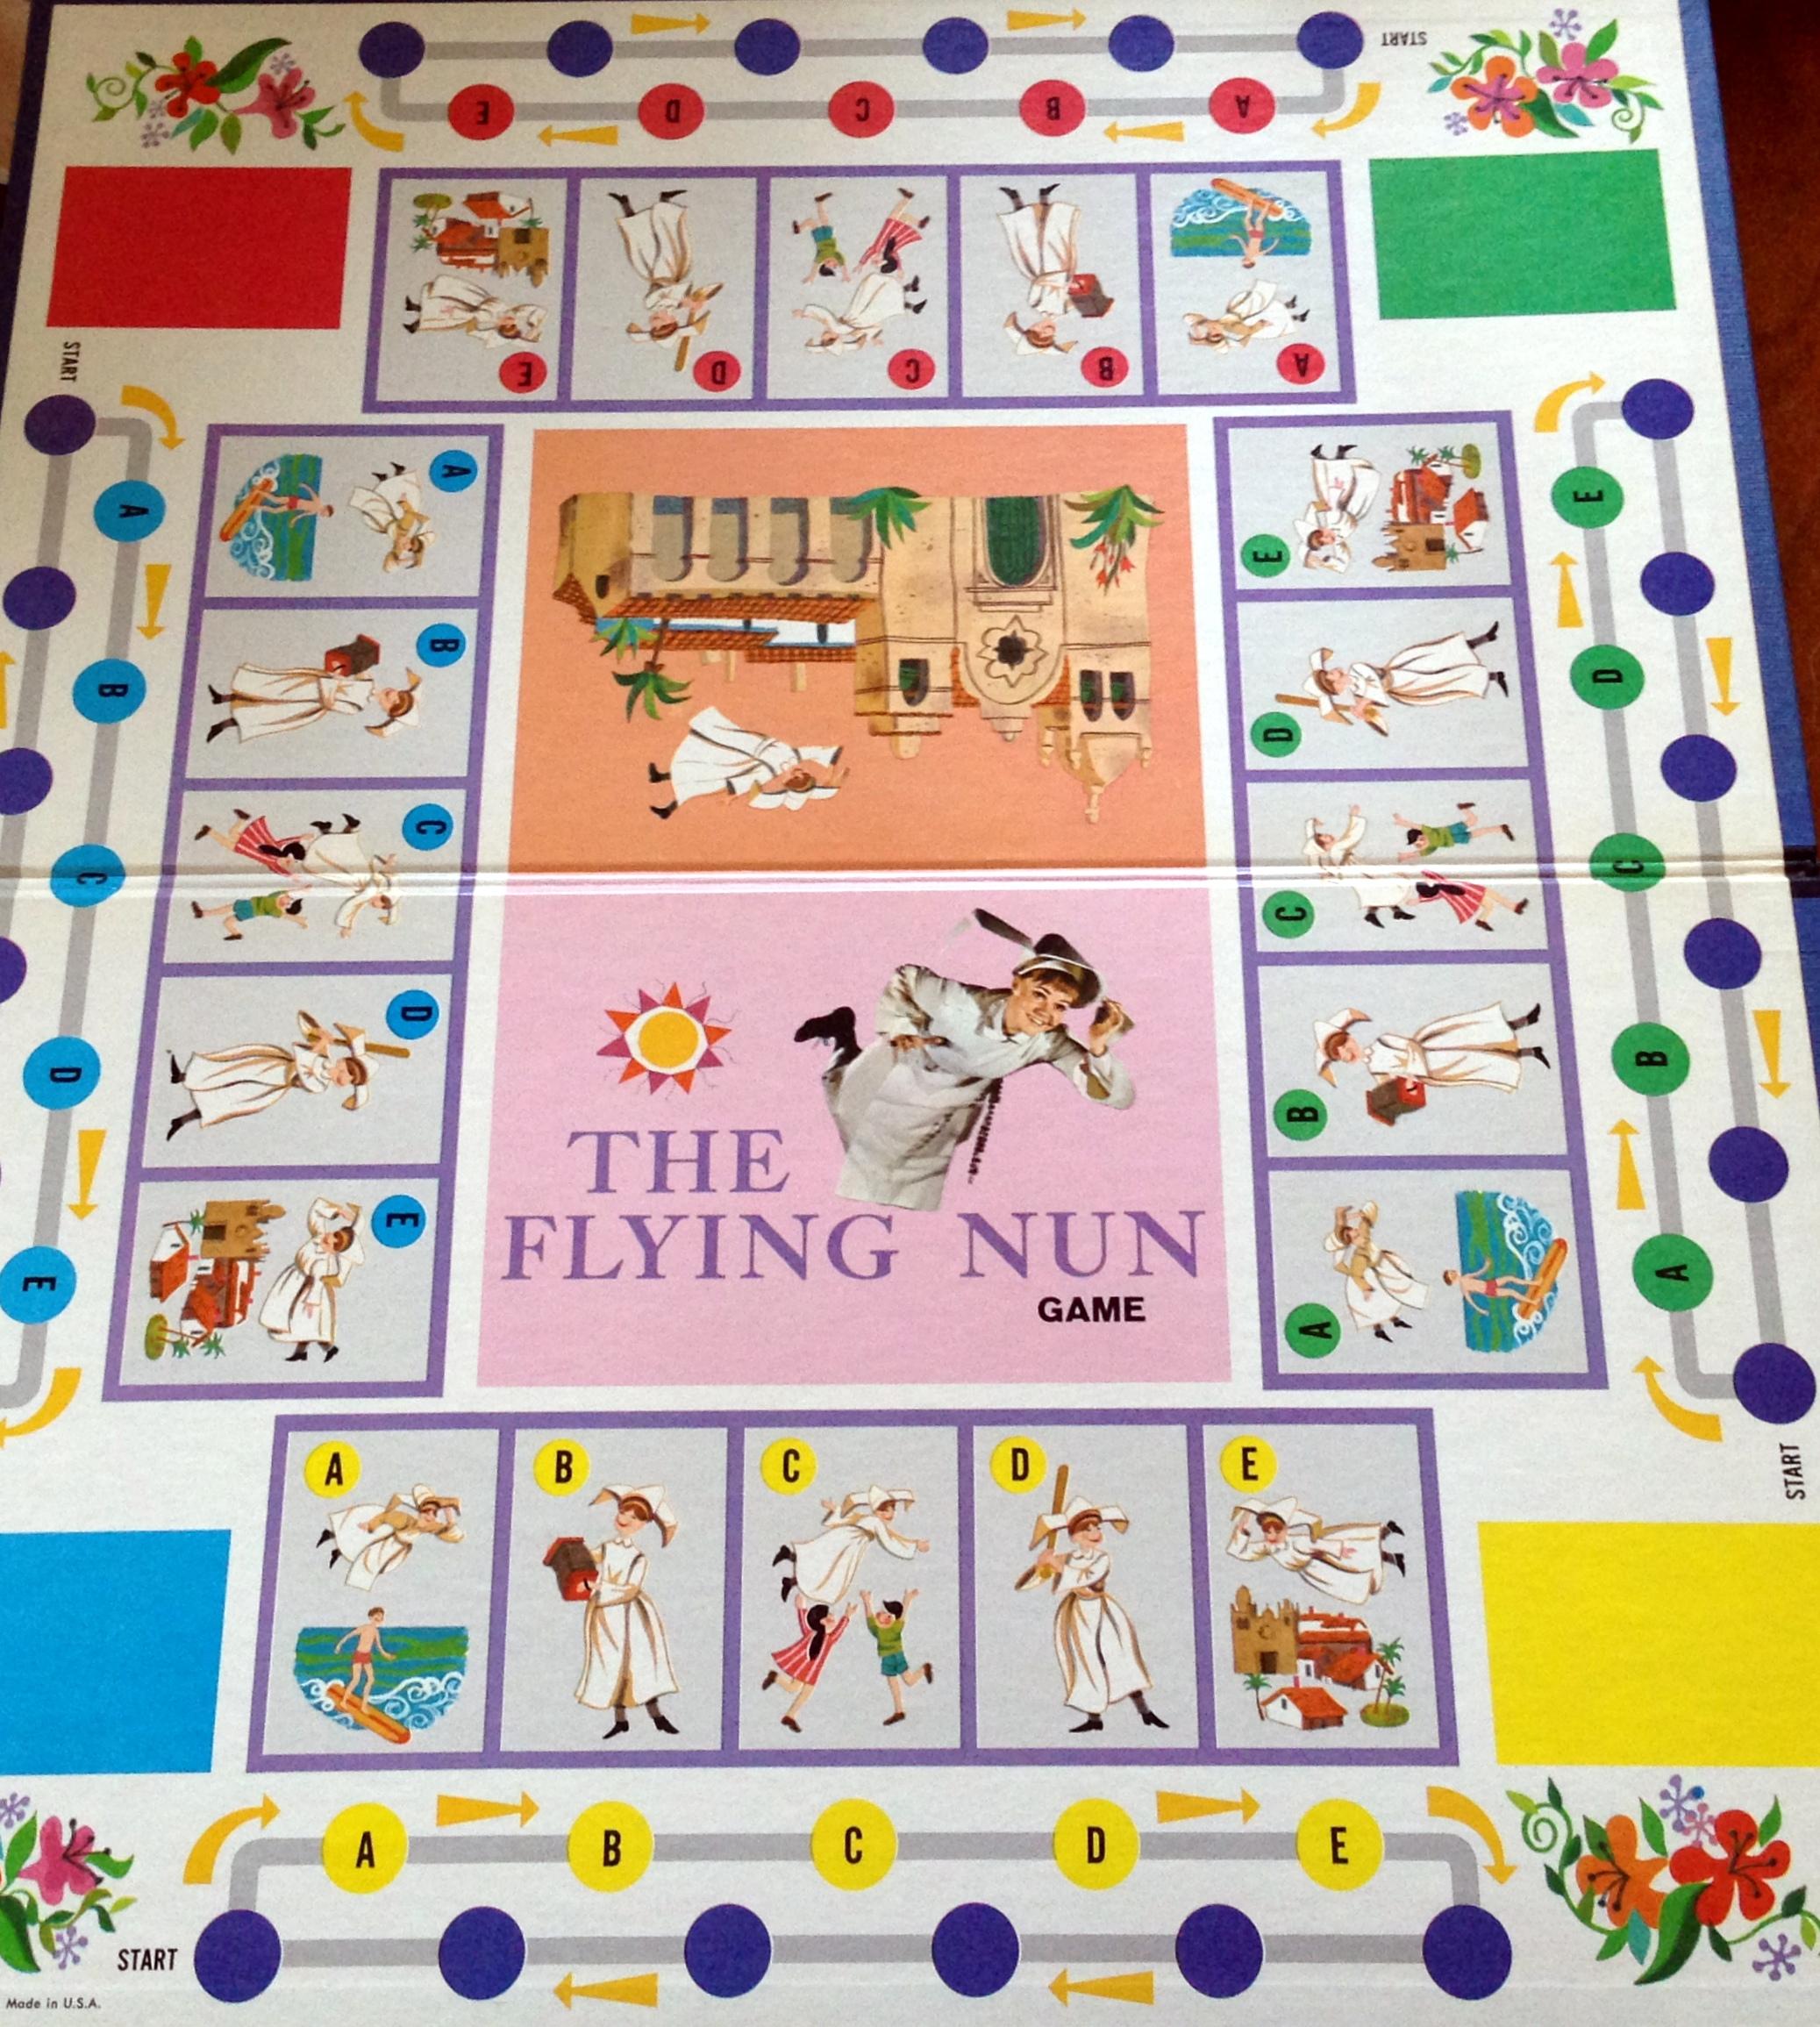 Life Game Board Spaces flying nun board